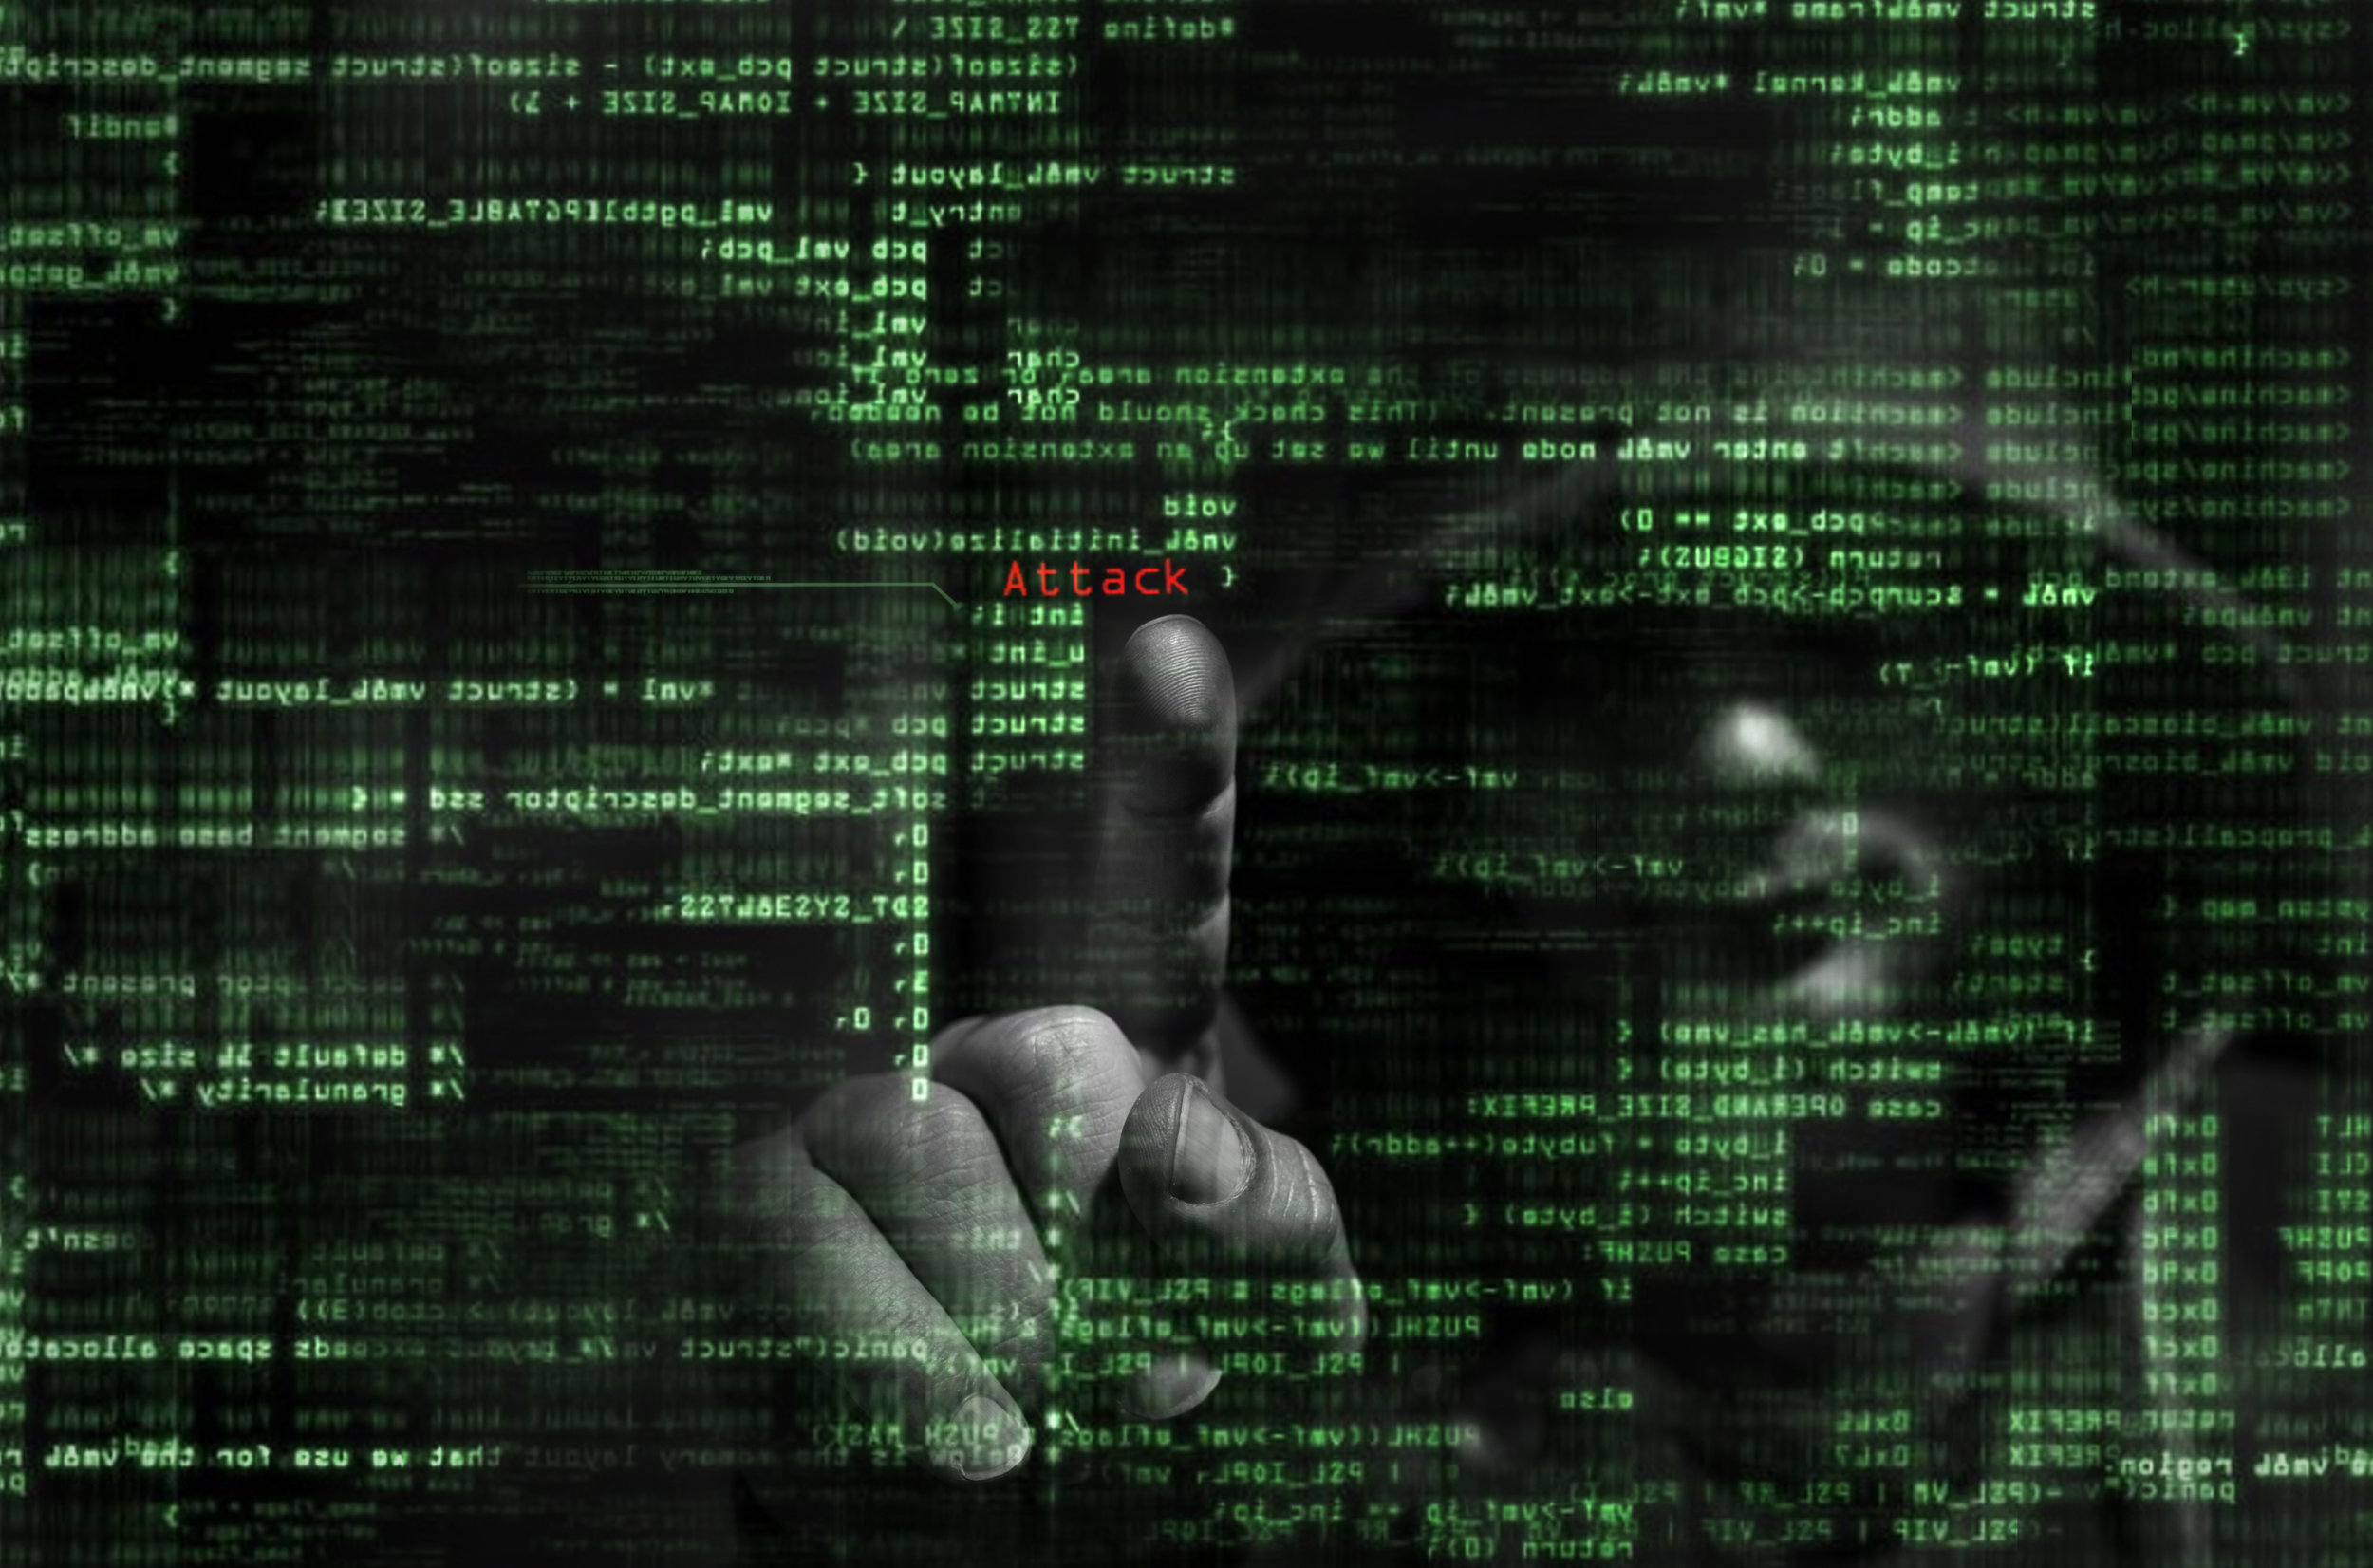 RedAttack_CyberAttack_shutterstock_225772180.jpg